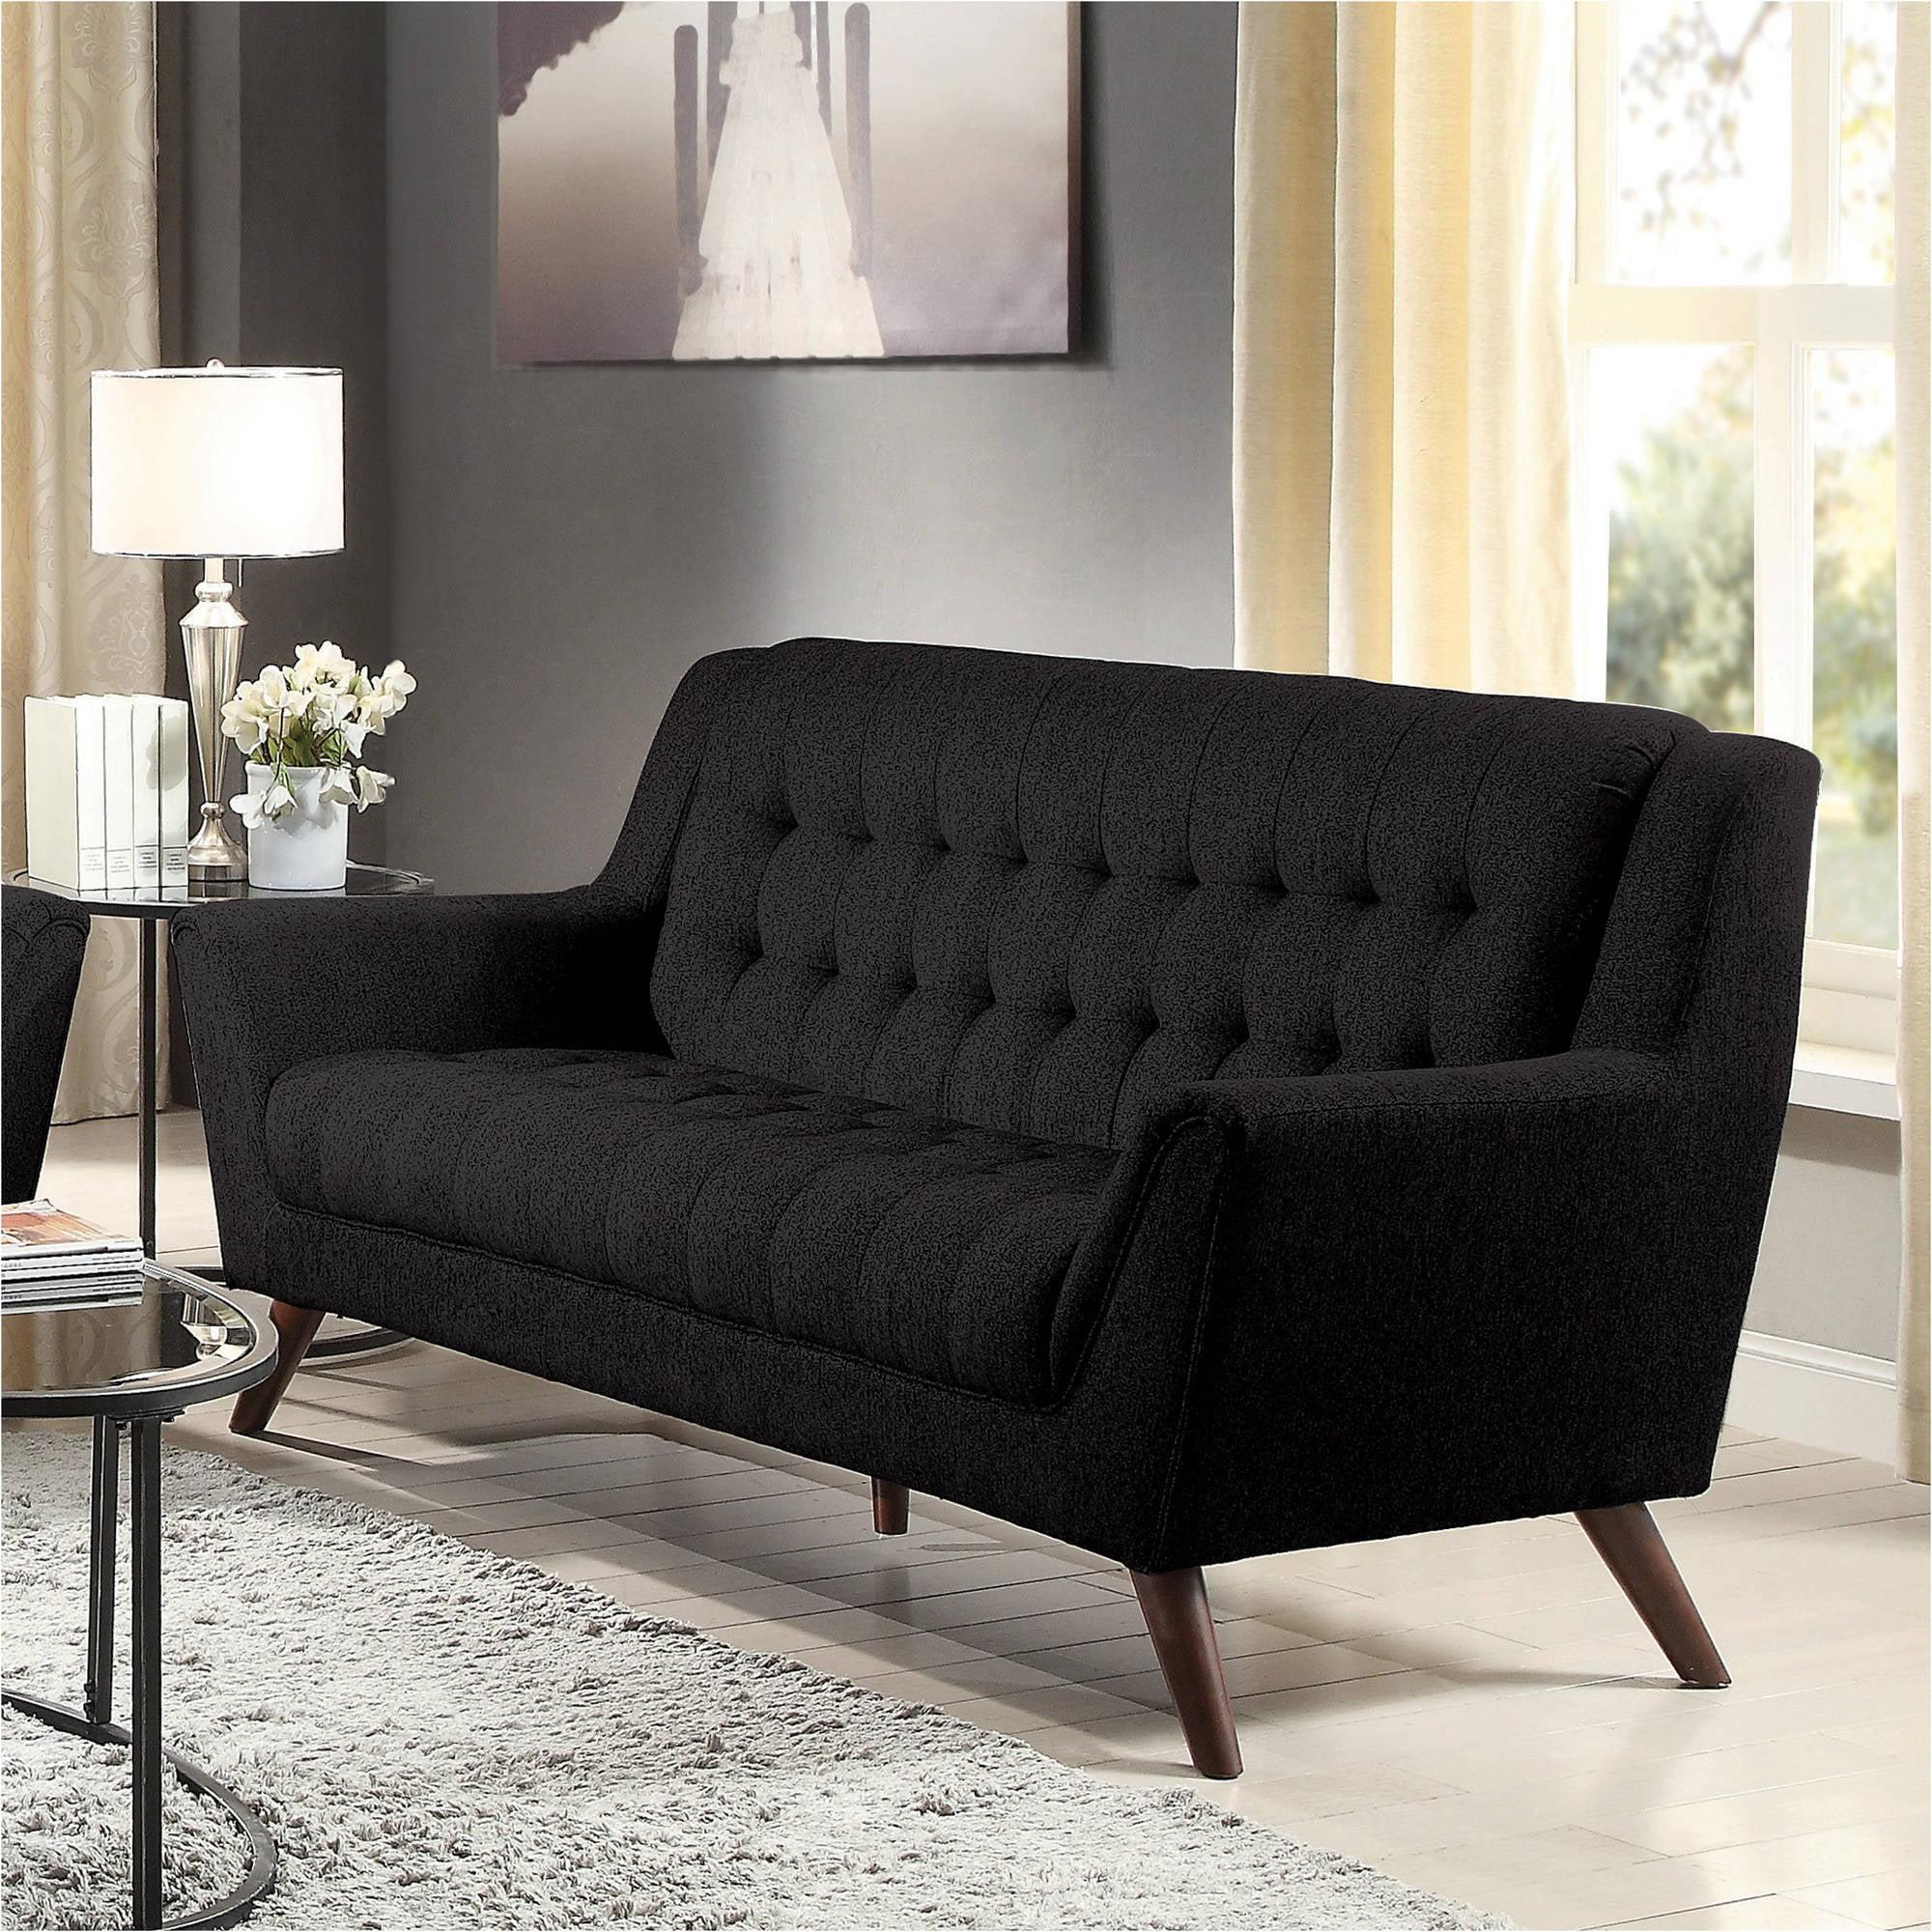 Coaster Baby Natalia Retro Mid-Century Modern Sofa, Multiple Colors